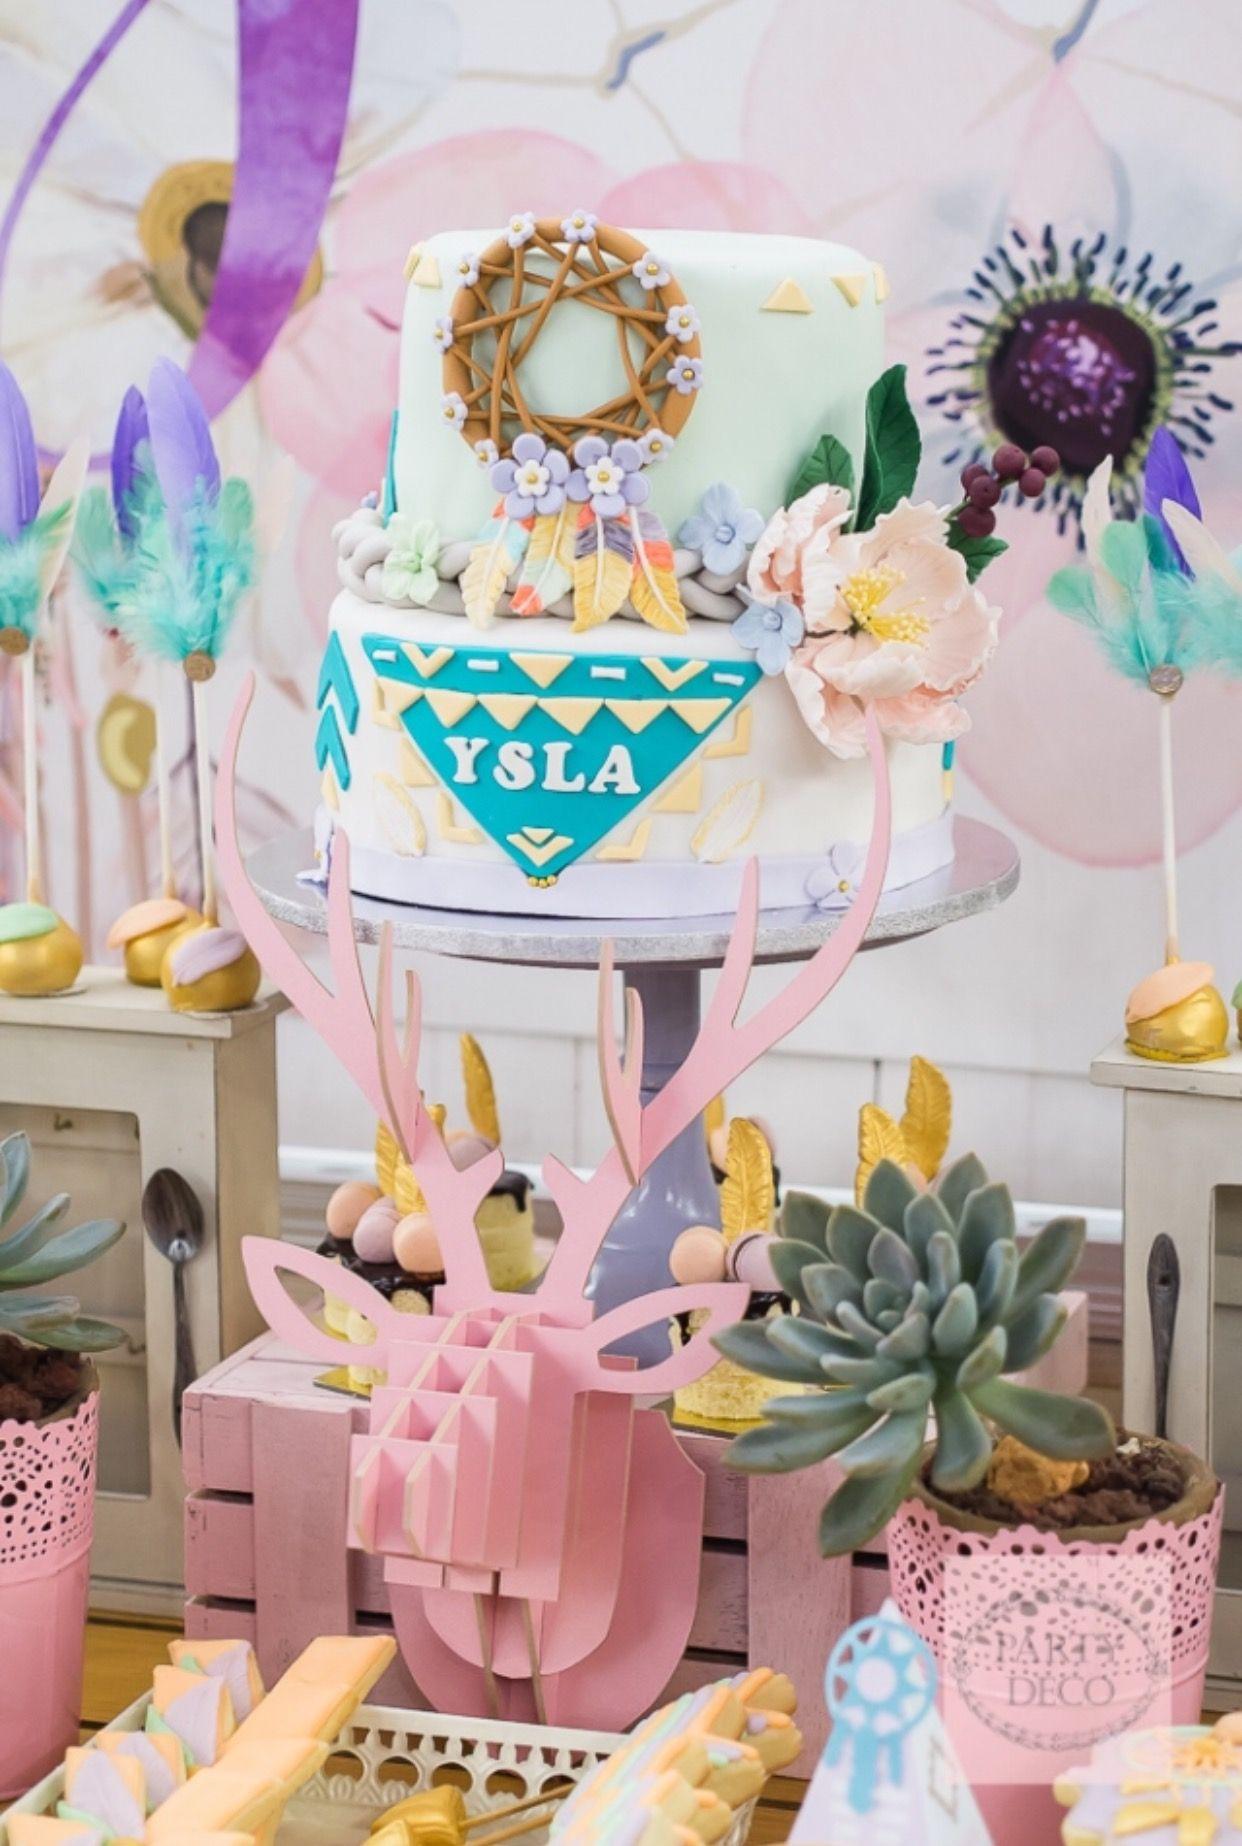 Yslas Boho Chic Themed Party Dessert Spread